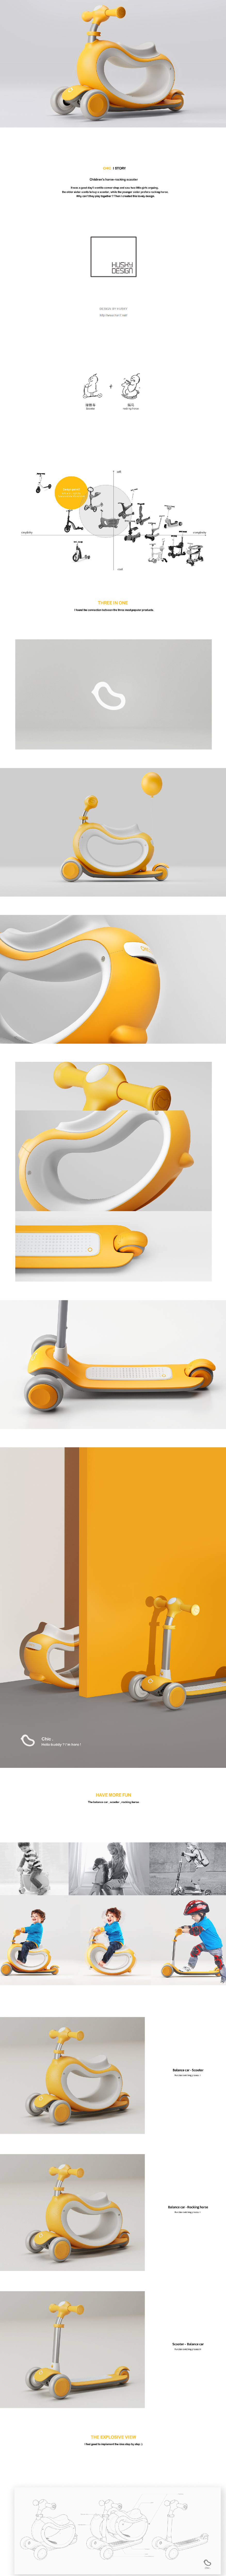 Industrial Design, Product Design, Branding